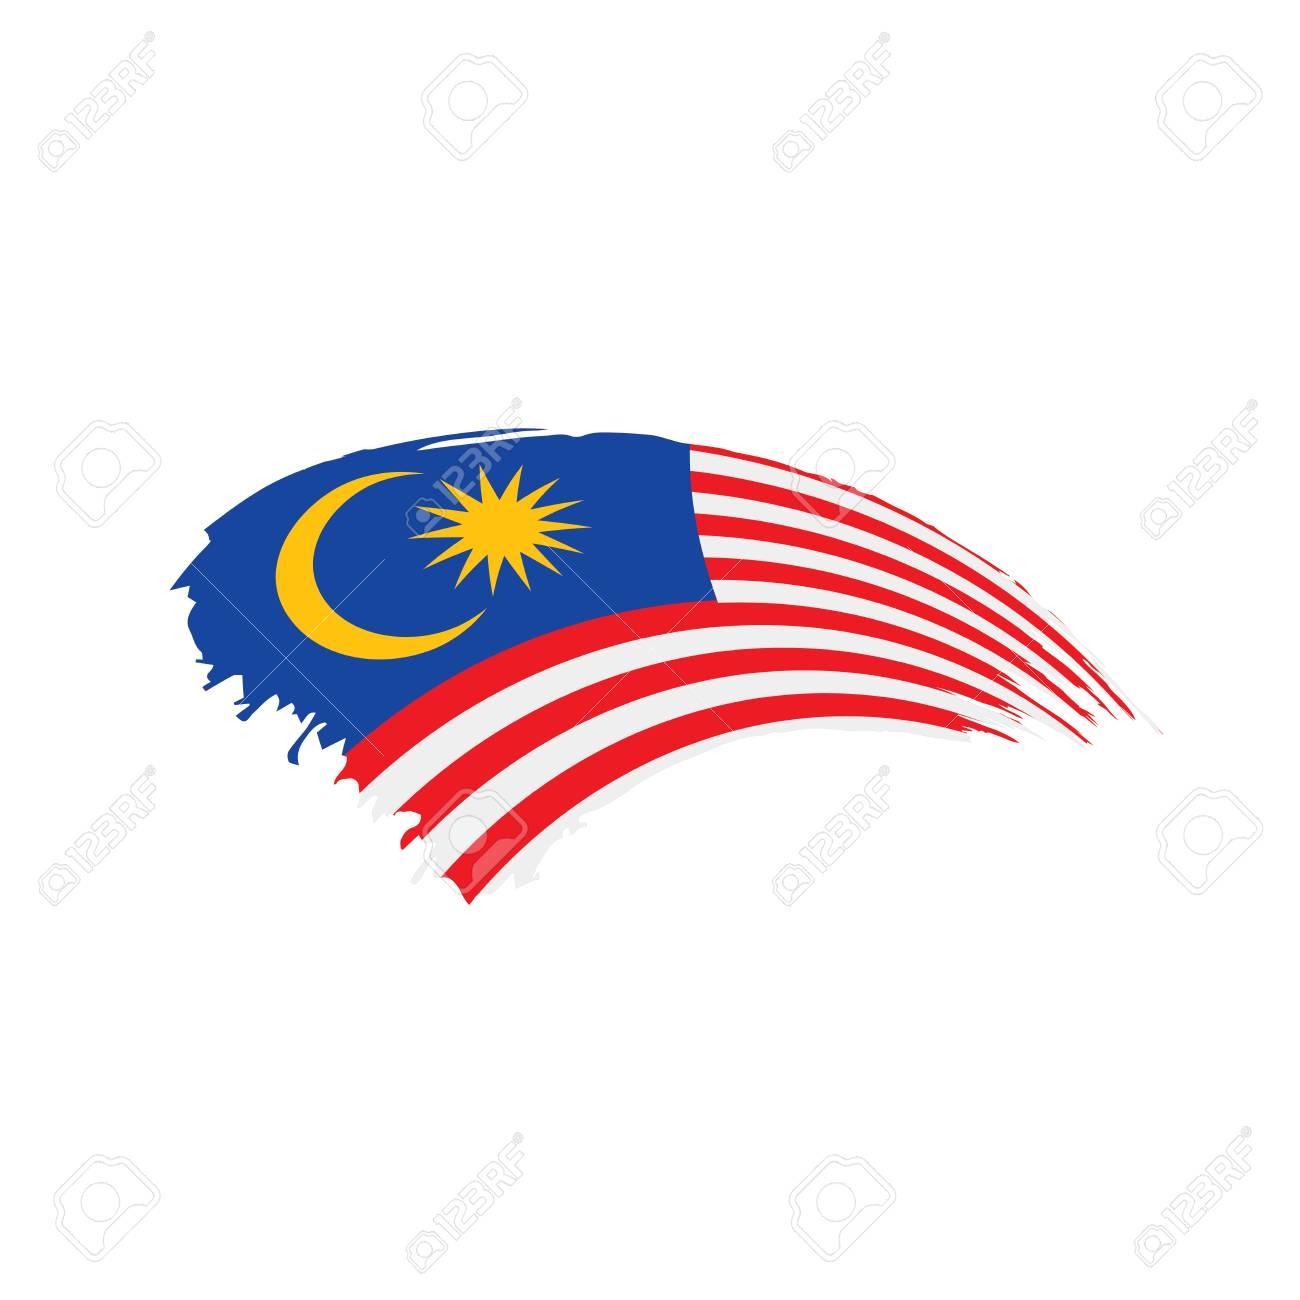 Malaysia flag, vector illustration - 96312647